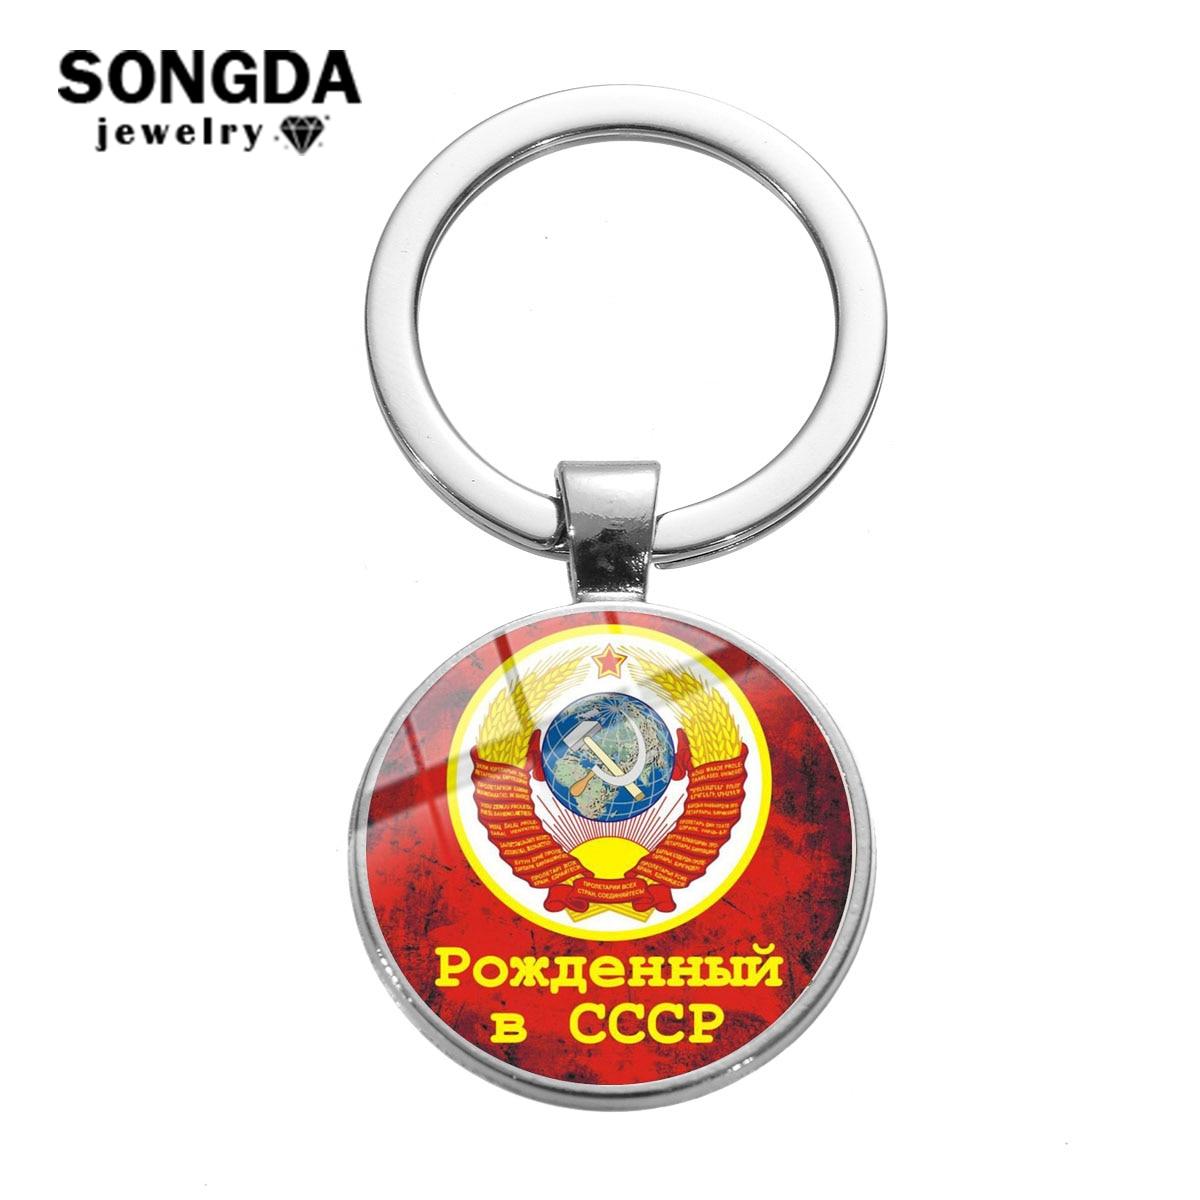 SONGDA Vintage USSR Soviet Badges Sickle Hammer Keychain CCCP Russia Emblem Communism Sign Top Grade Silver Color Key Chain Gift